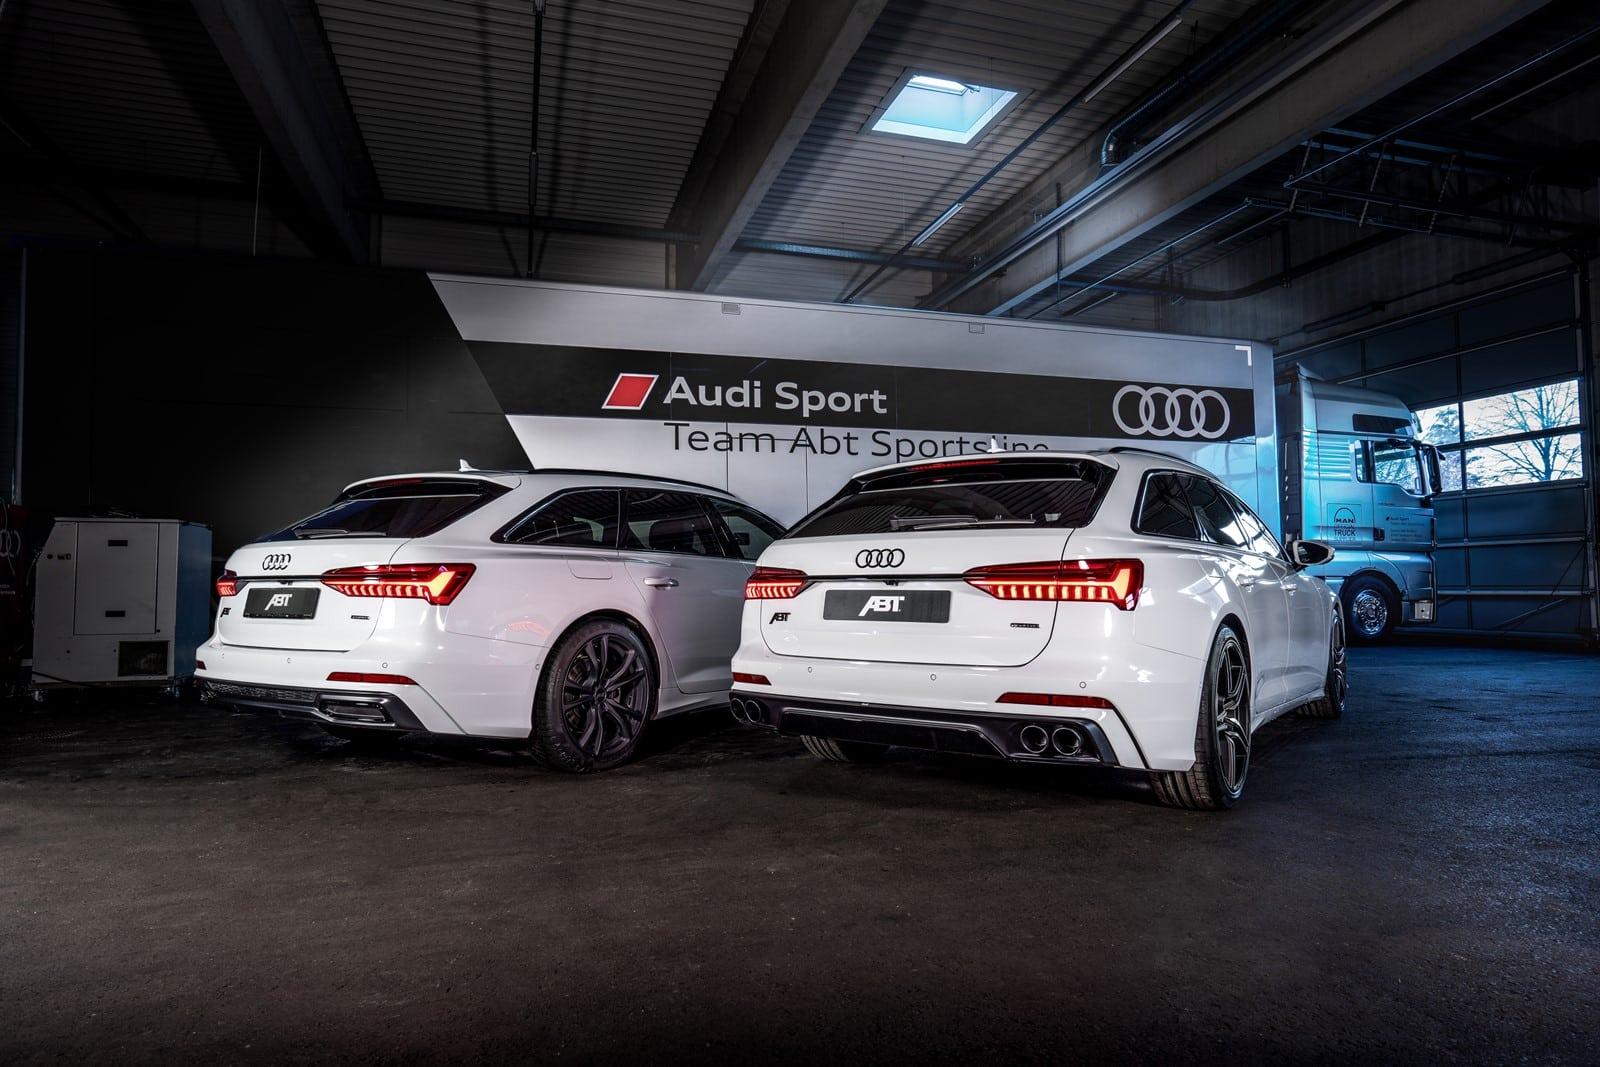 Audi-A6-Avant-ABT-aero-package-11.jpg